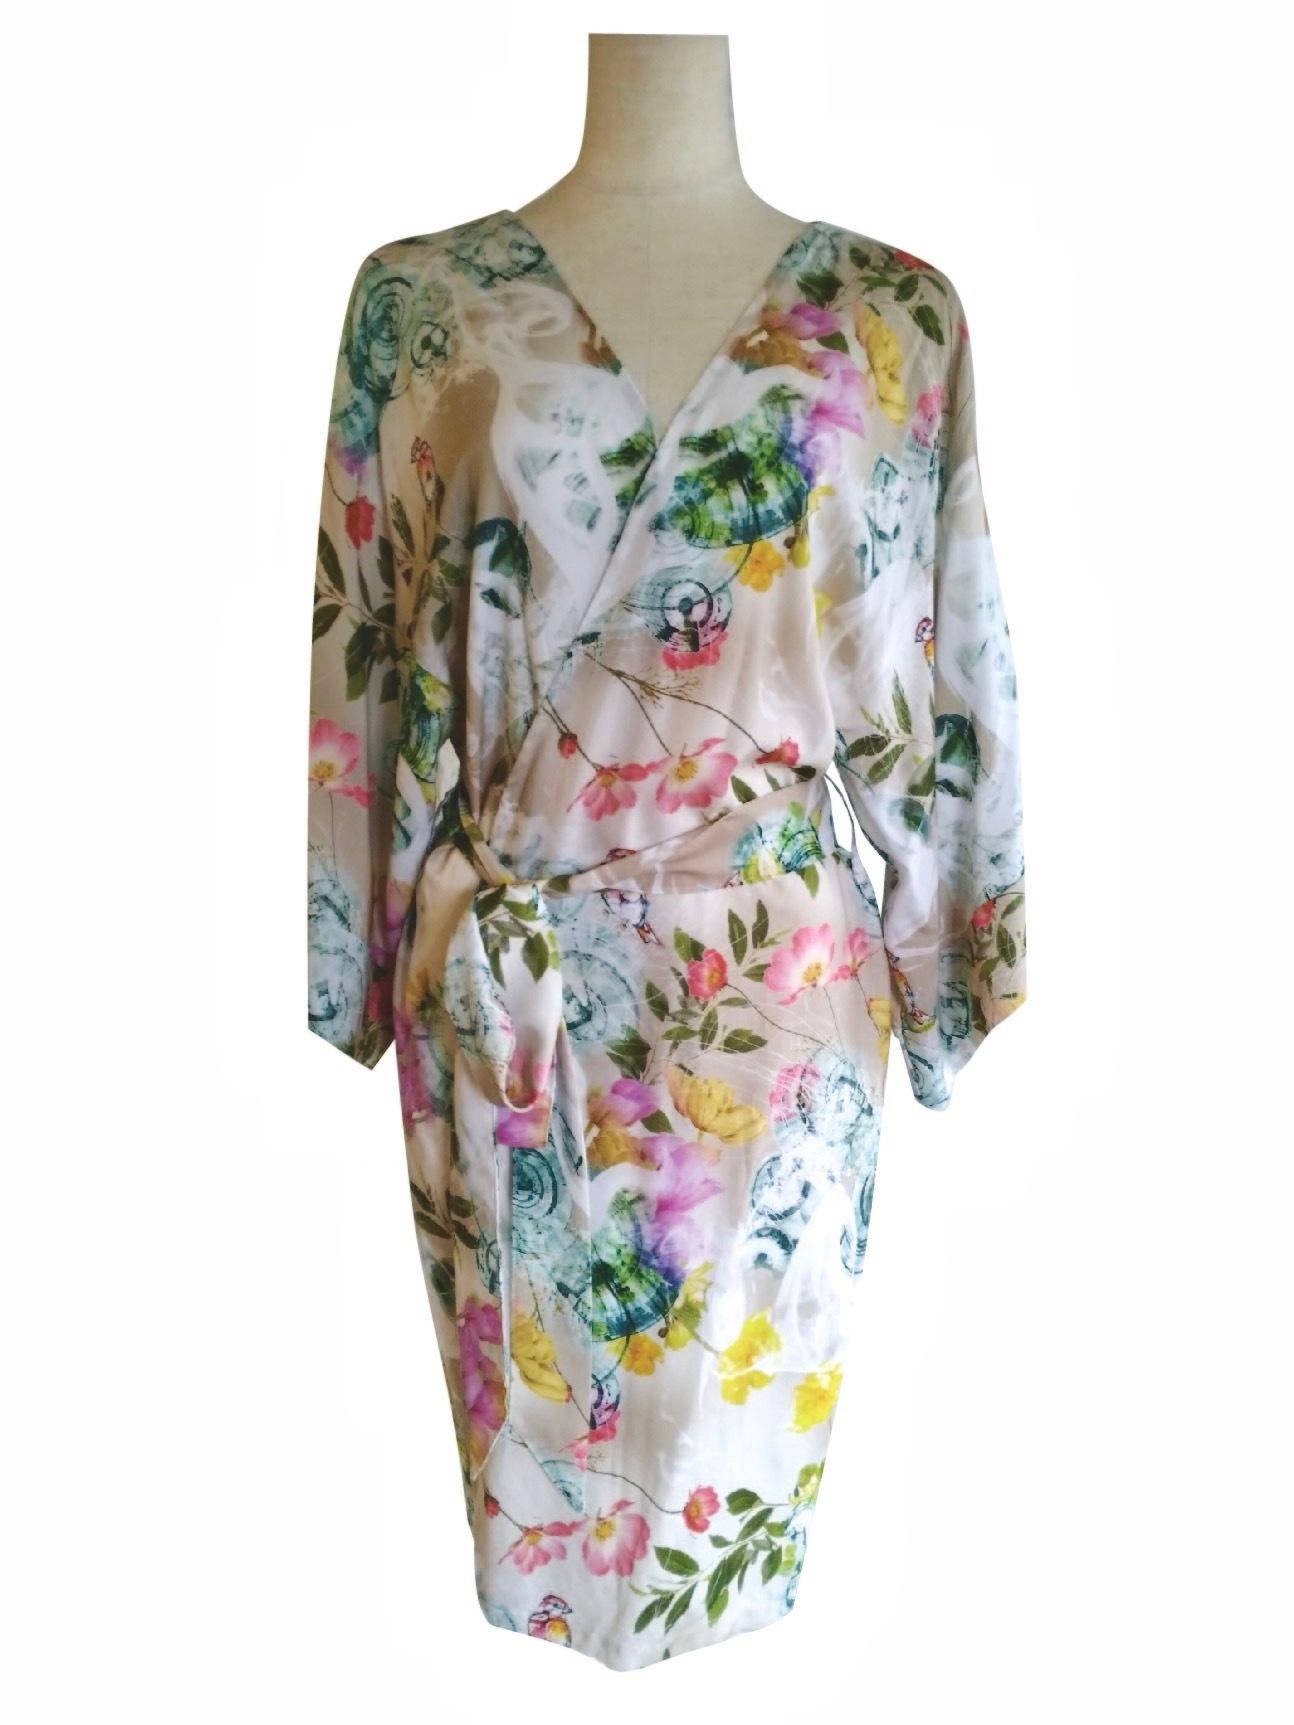 Kimono Robe Midium length Bird Cottage ローブミディアム丈 バードコテージ